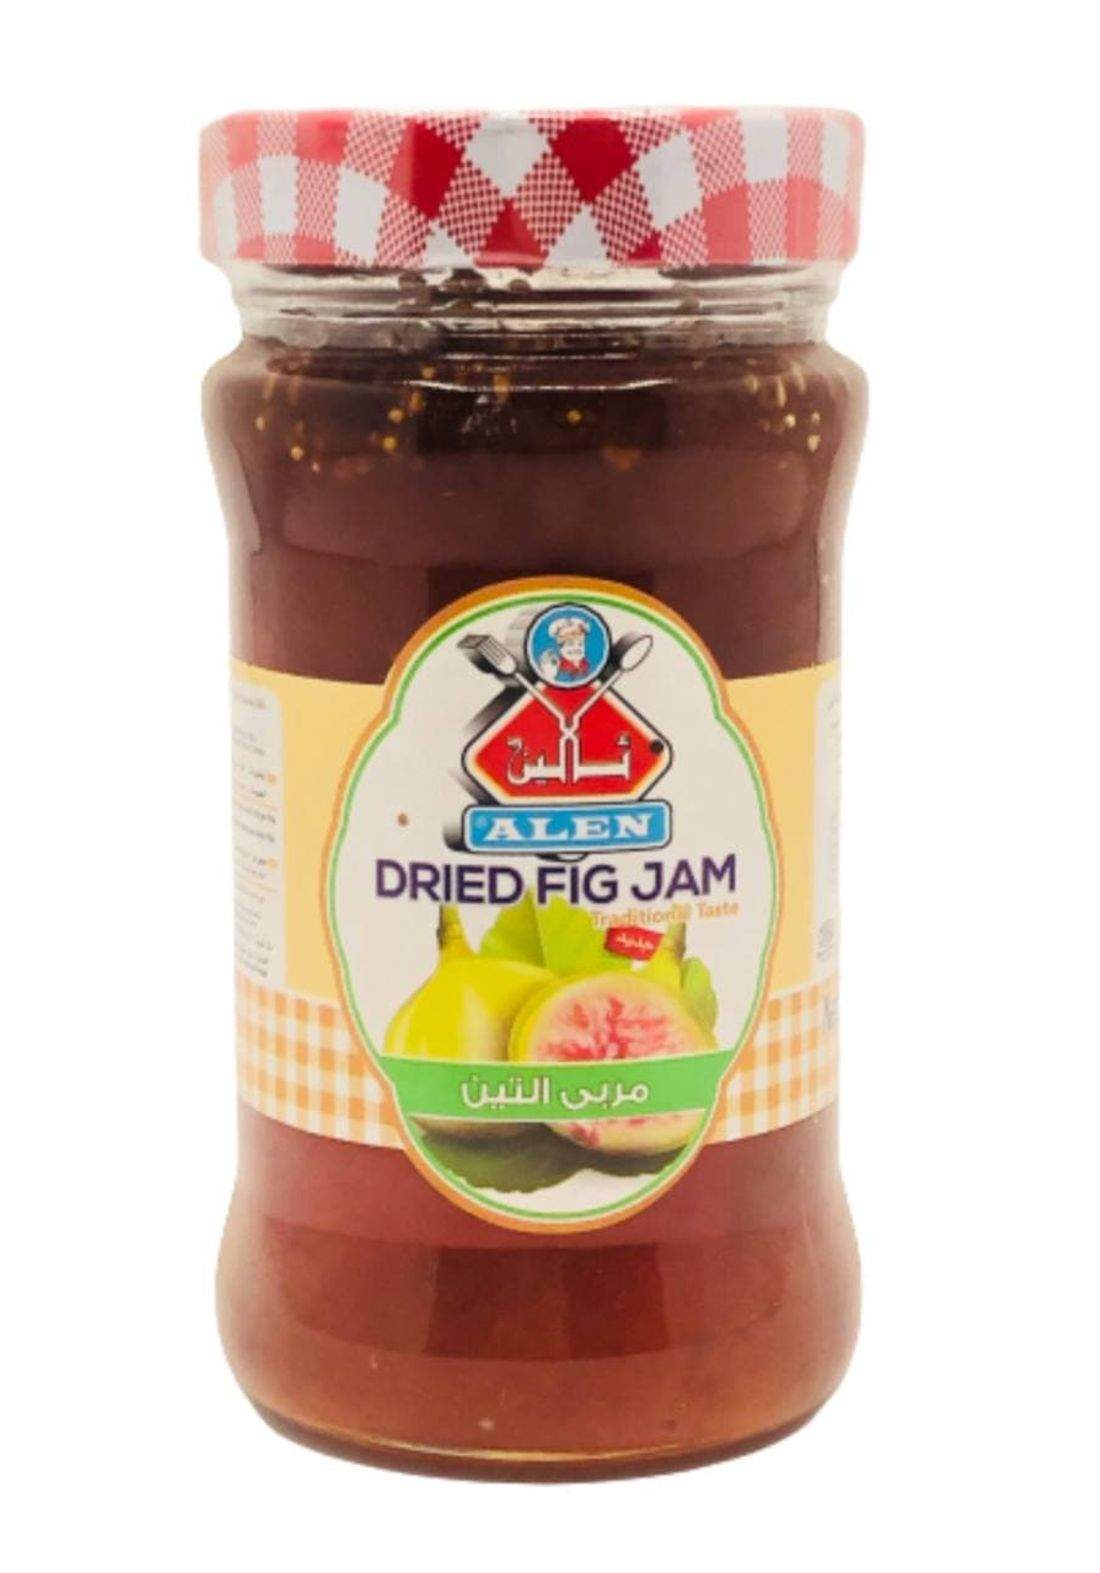 Alen dried flg jam 380g ئالين مربى التين